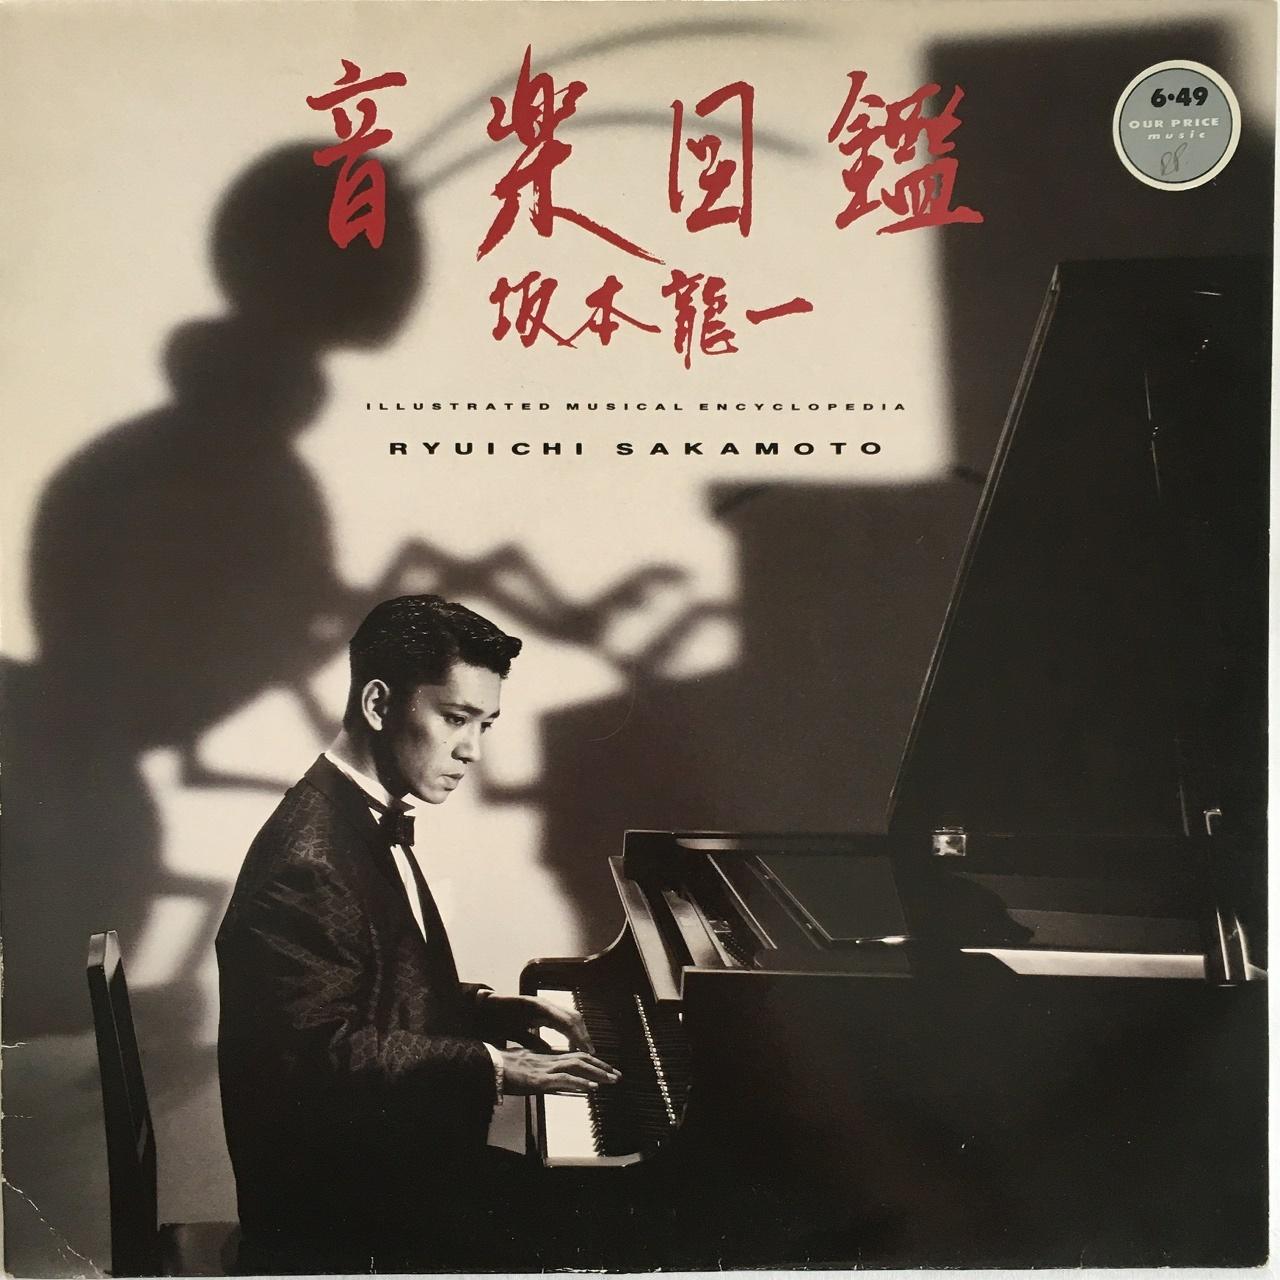 【LP・英盤】Ryuichi Sakamoto / Illustrated Musical Encyclopedia